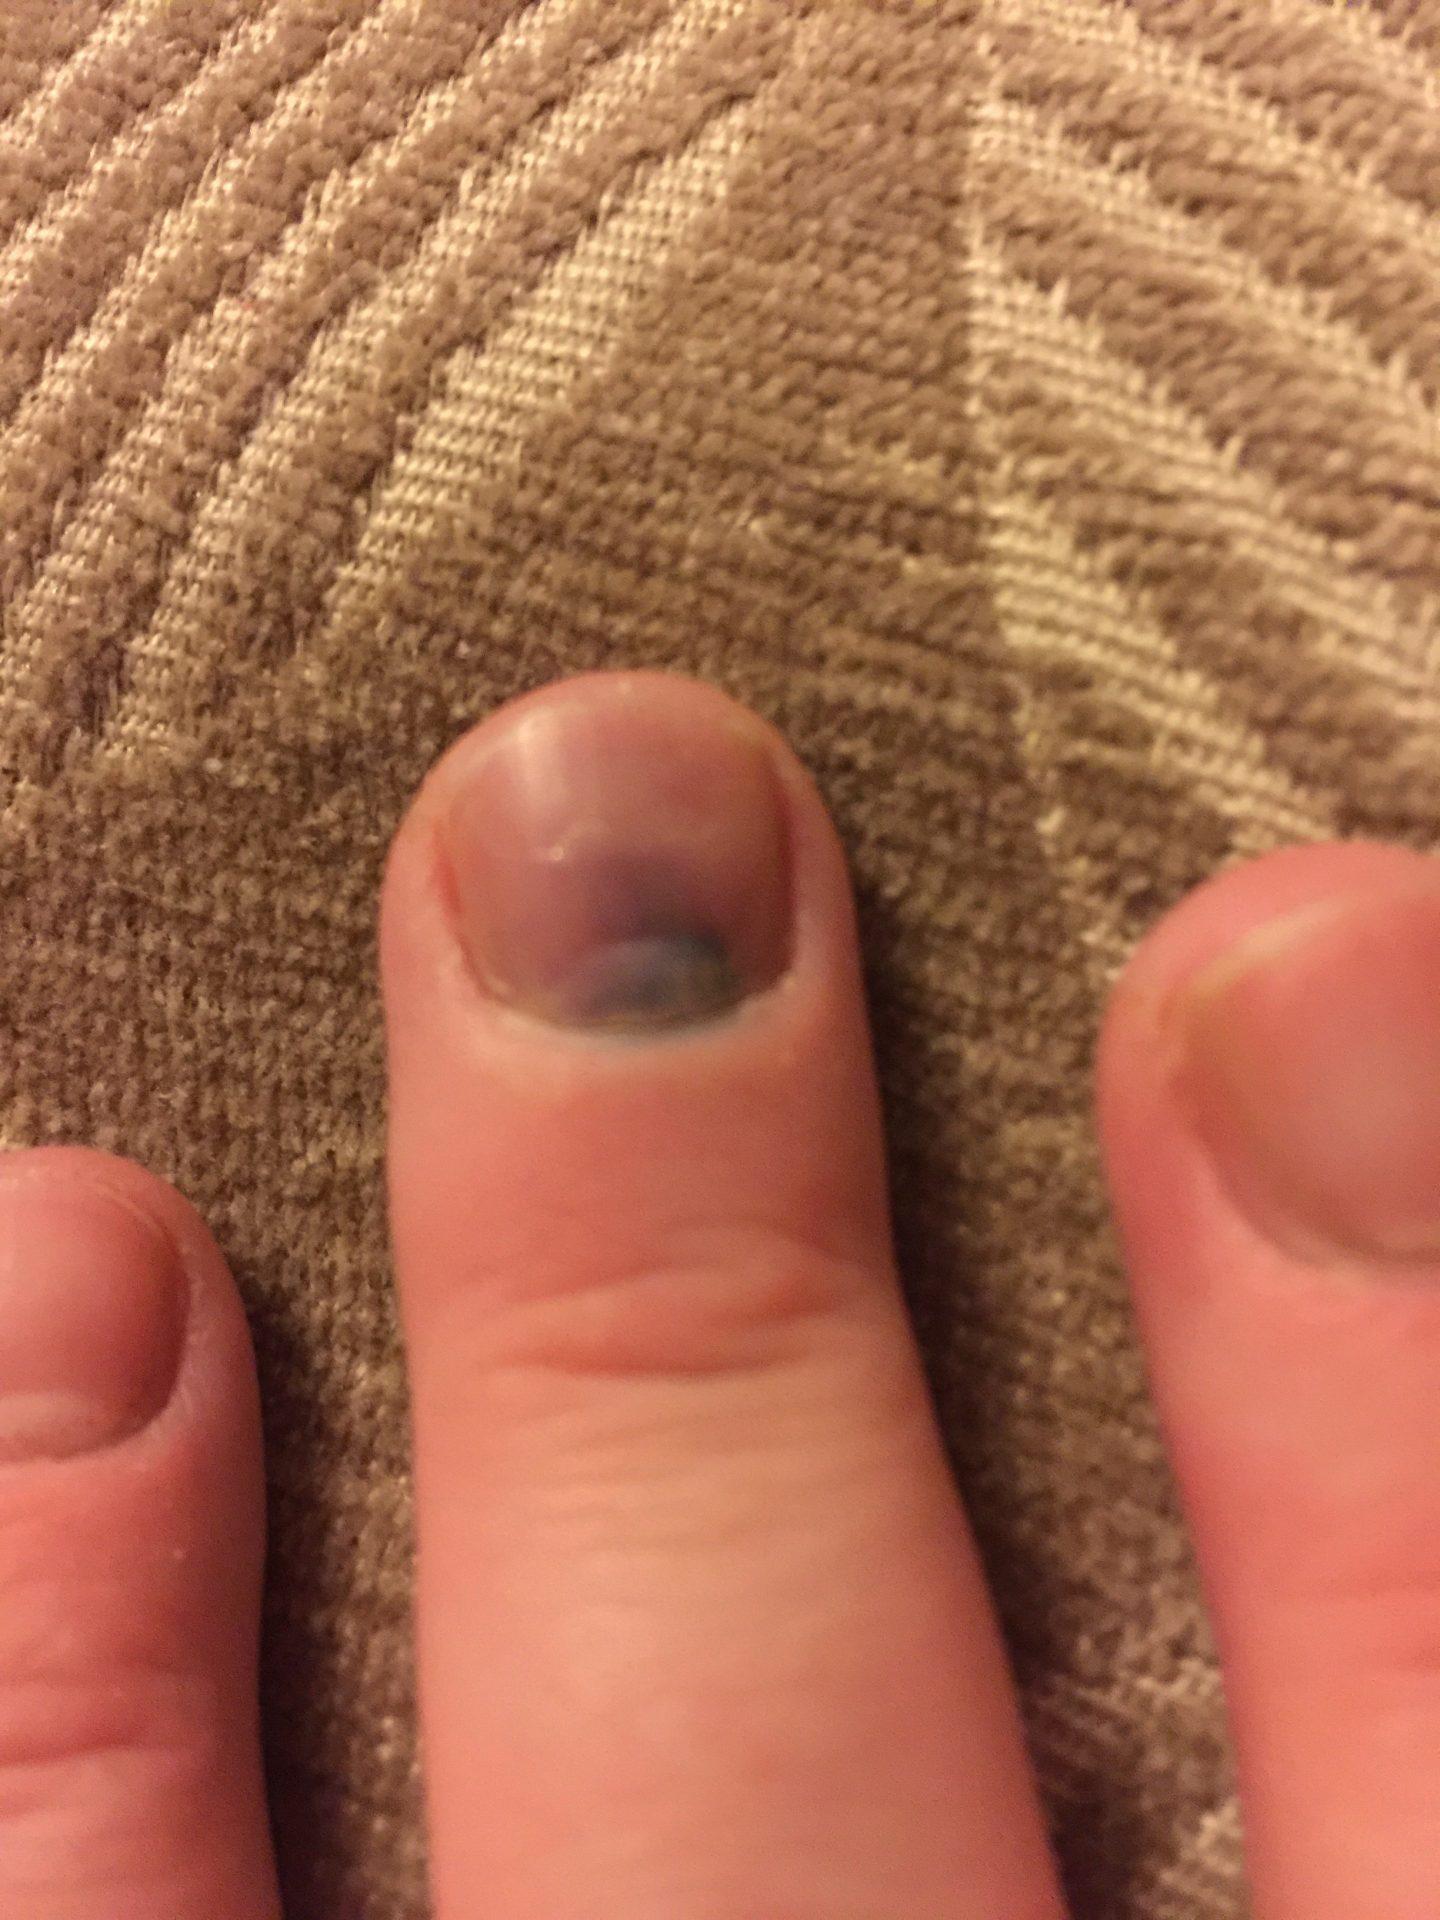 I Have Smashed My Essential 'Middle Finger'.